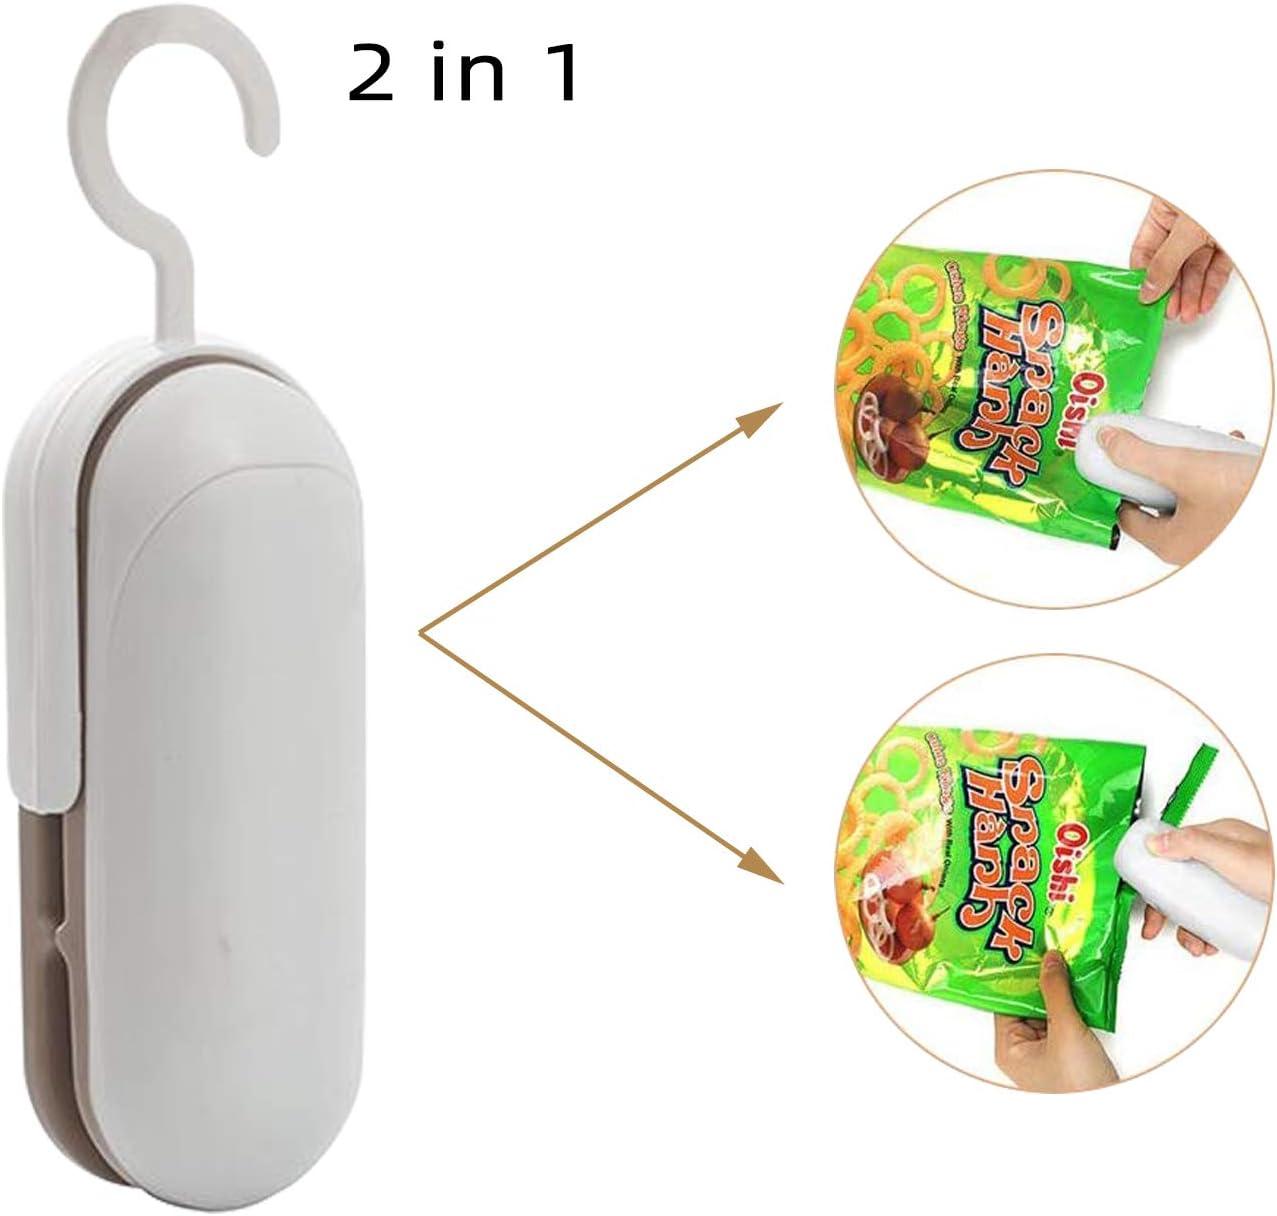 Mini Bag Sealer, Rlloy 2 in 1 Heat Sealer with Cutter,Handheld Portable Vacuum Sealers Snack Bag Resealer for Saving Freeze Vegetable Storage (Battery Not Included)